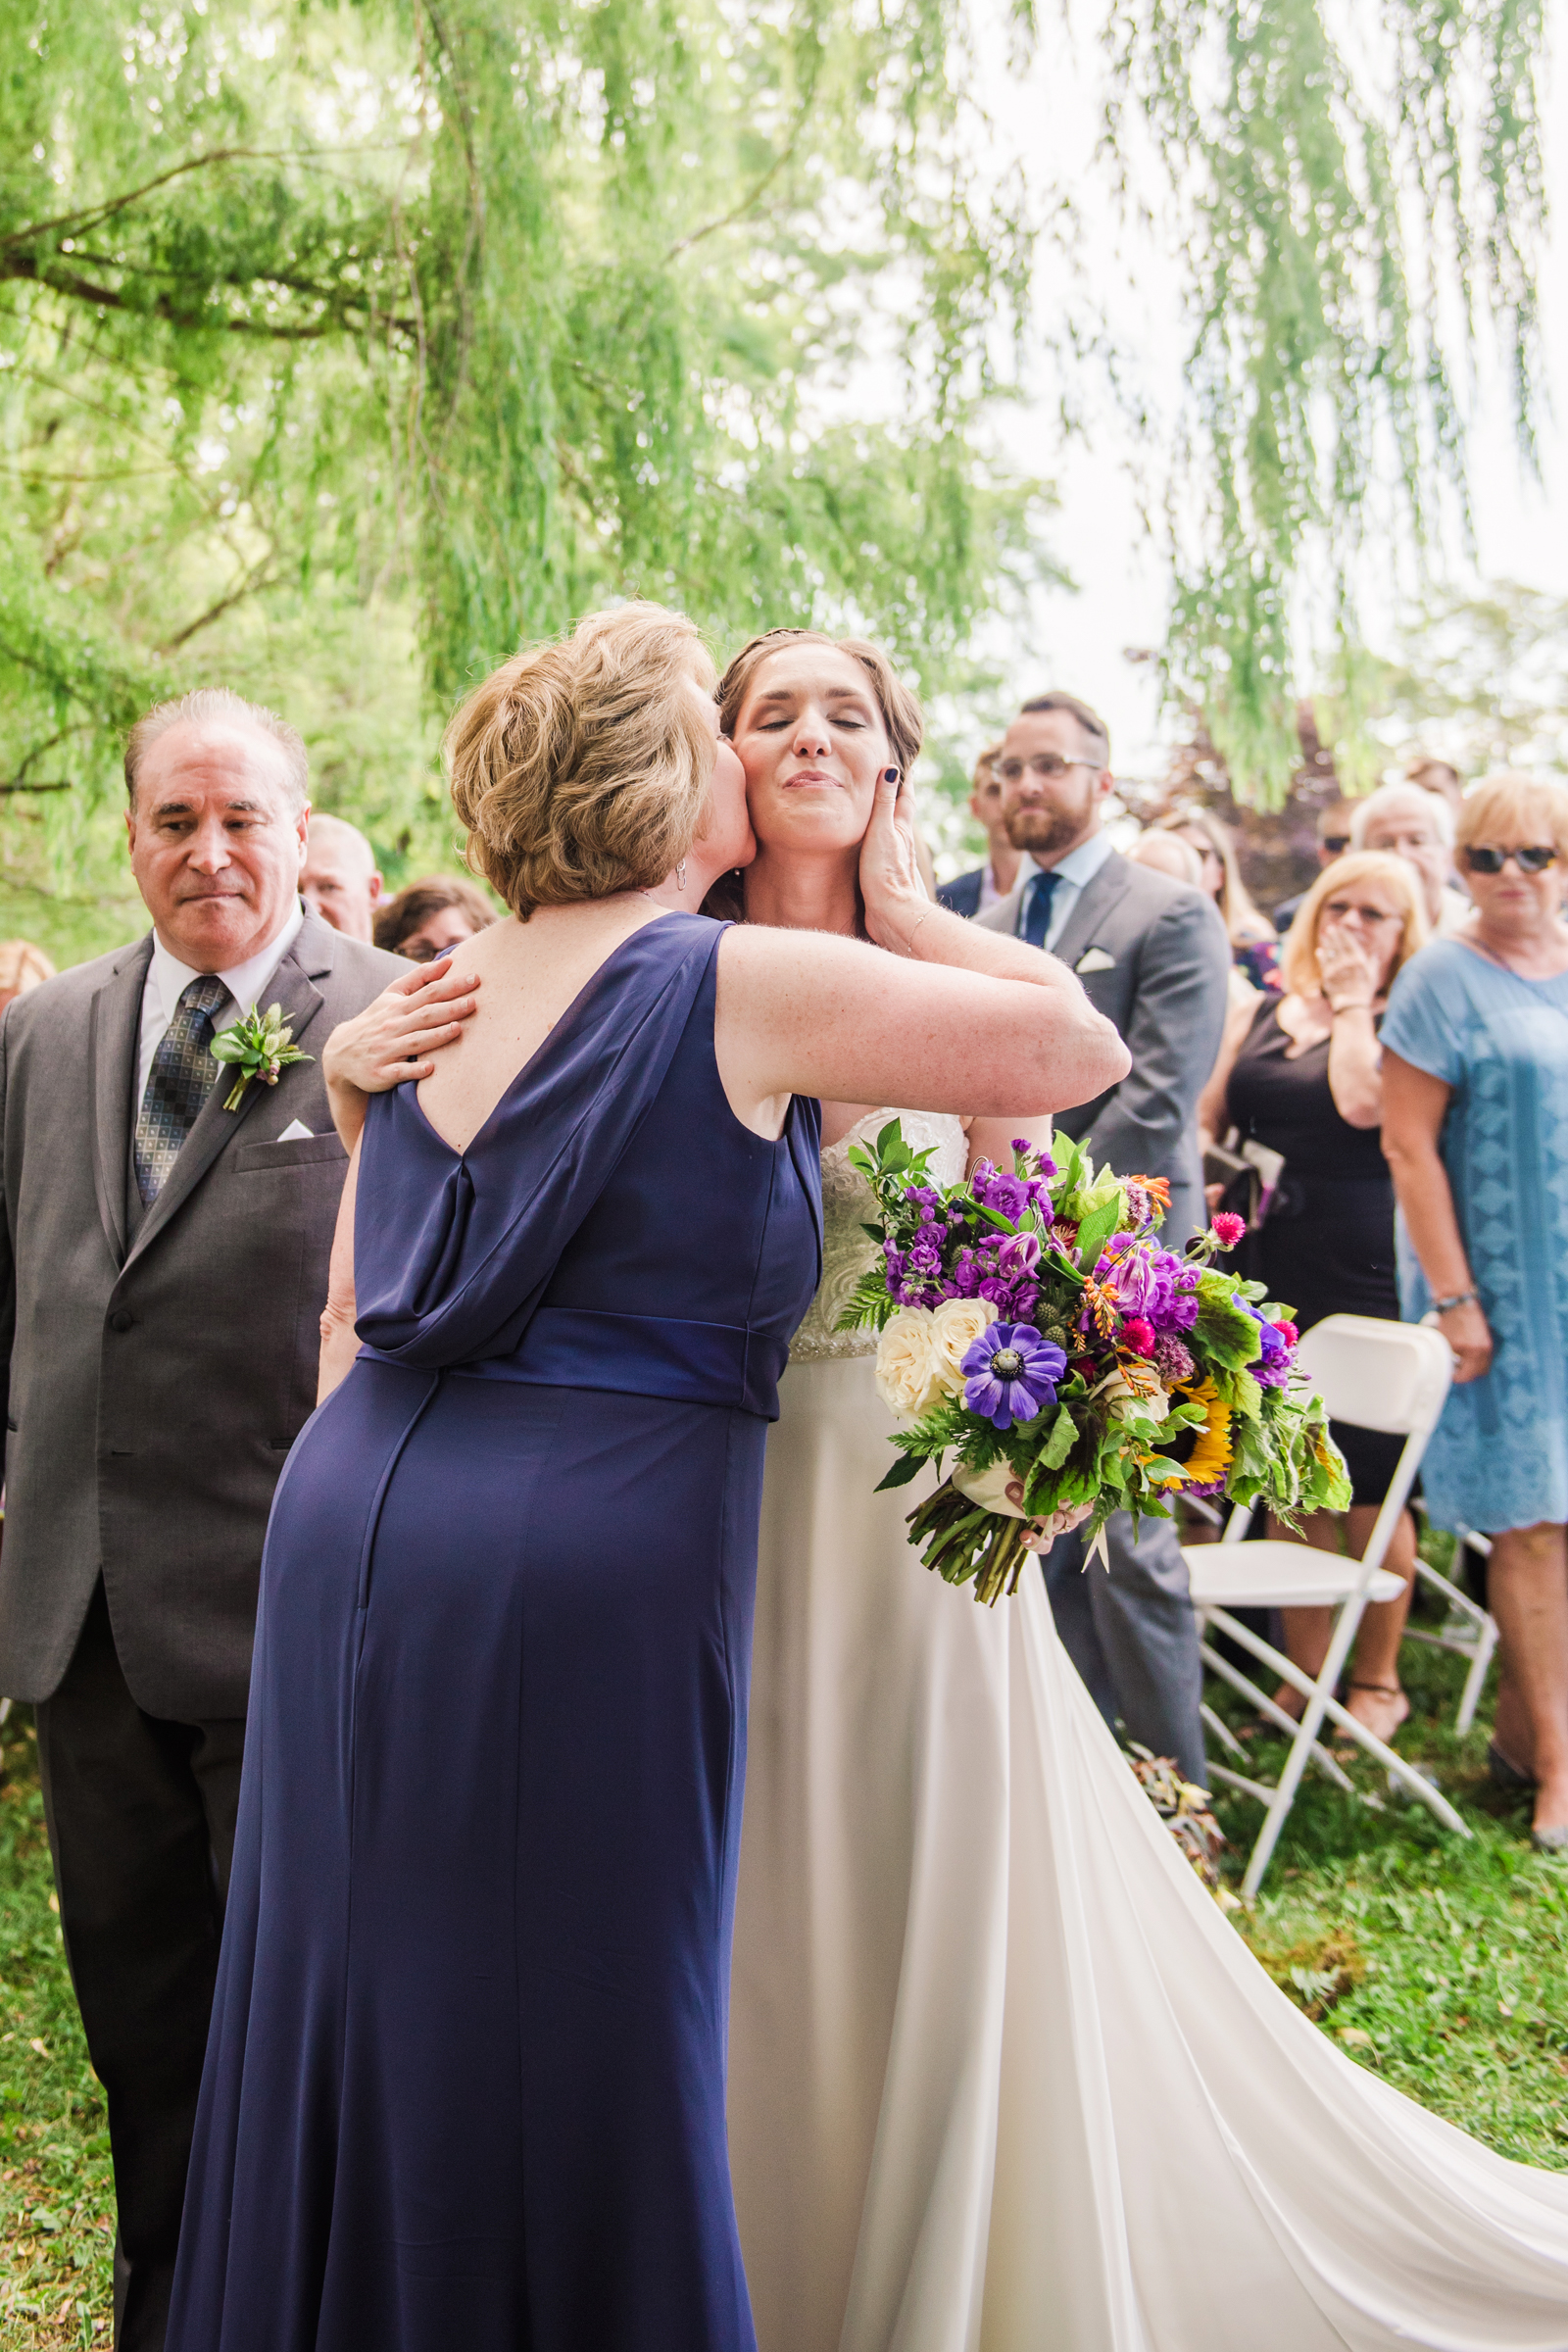 Jerris_Wadsworth_Wedding_Barn_Rochester_Wedding_JILL_STUDIO_Rochester_NY_Photographer_DSC_2602.jpg